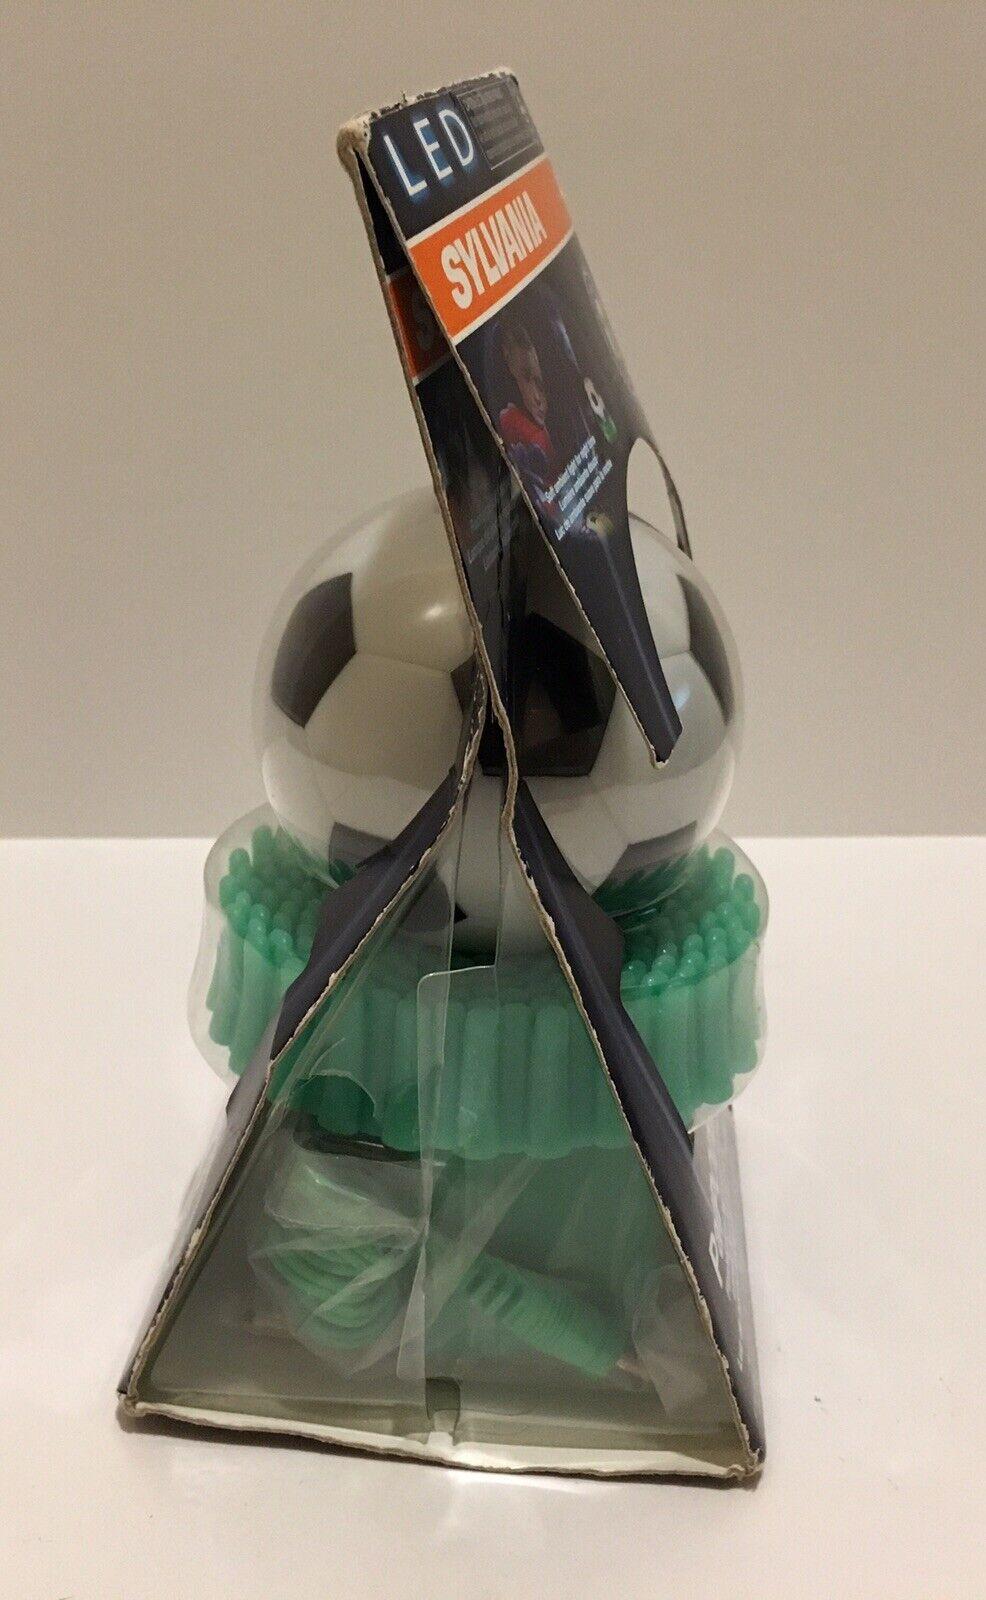 PalPODzzz Sylvania LED Soccer Ball Nightlight /& Flashlight Emergency Light Open